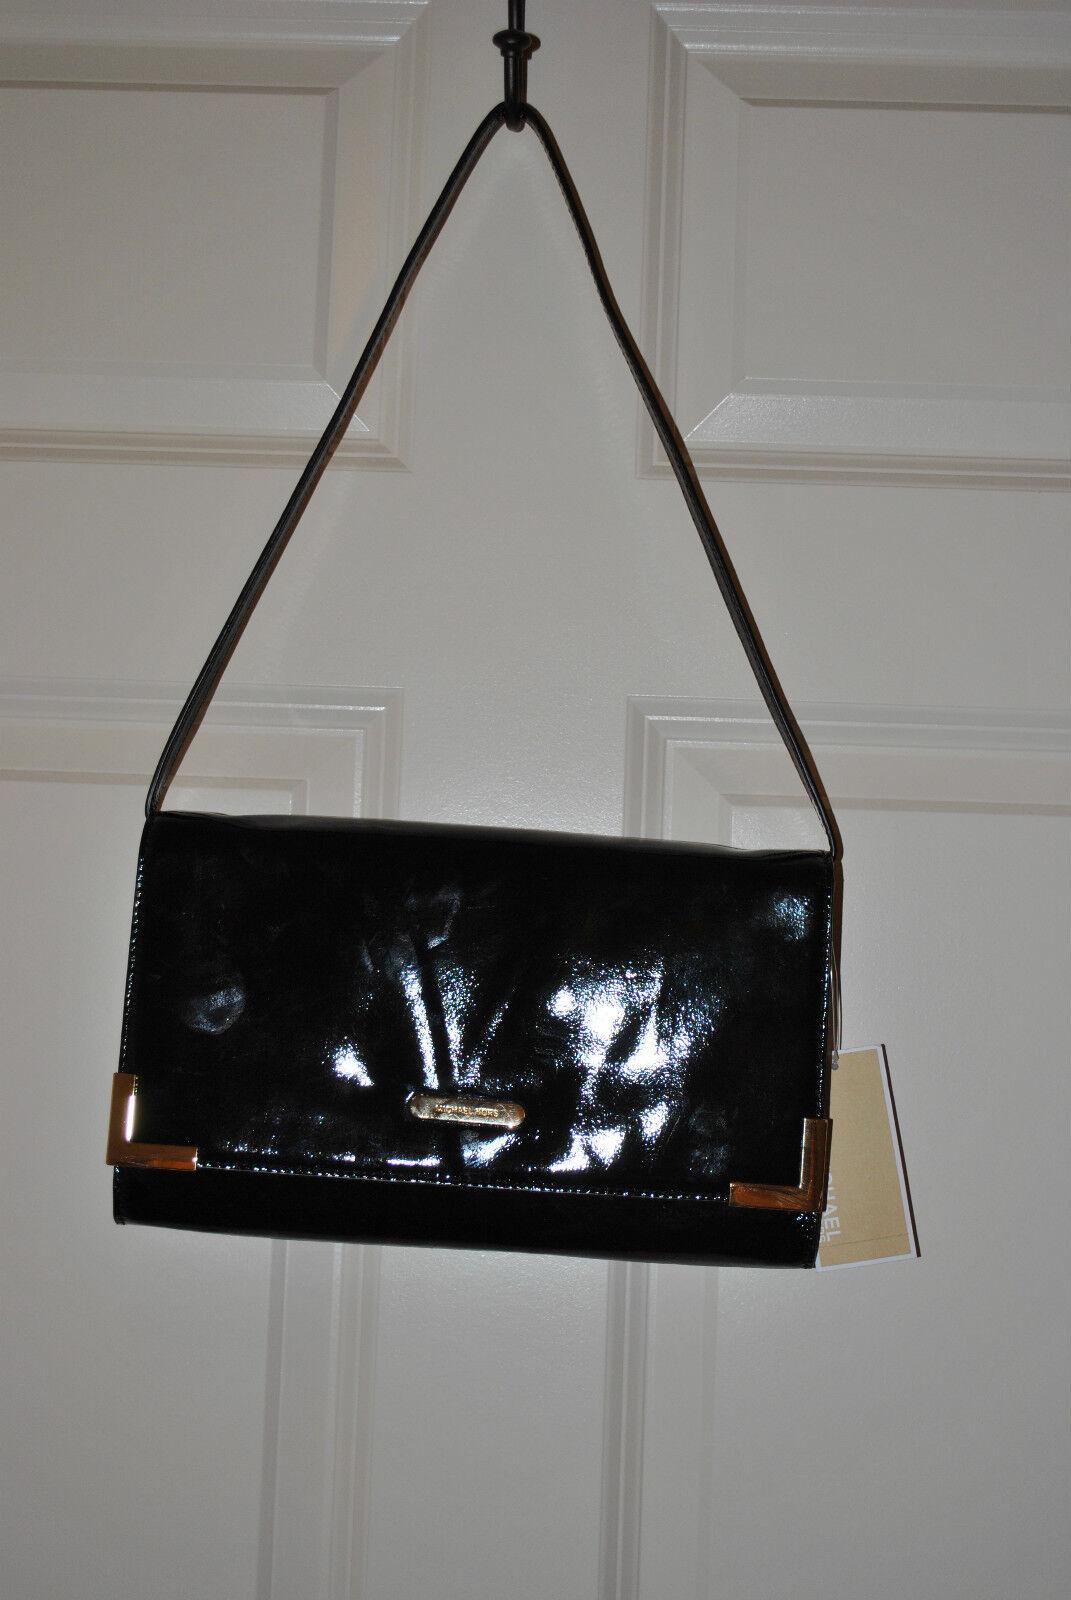 ebac6201906e Michael Kors Black Leather Beverly Oversized Clutch Handbag Bag ...